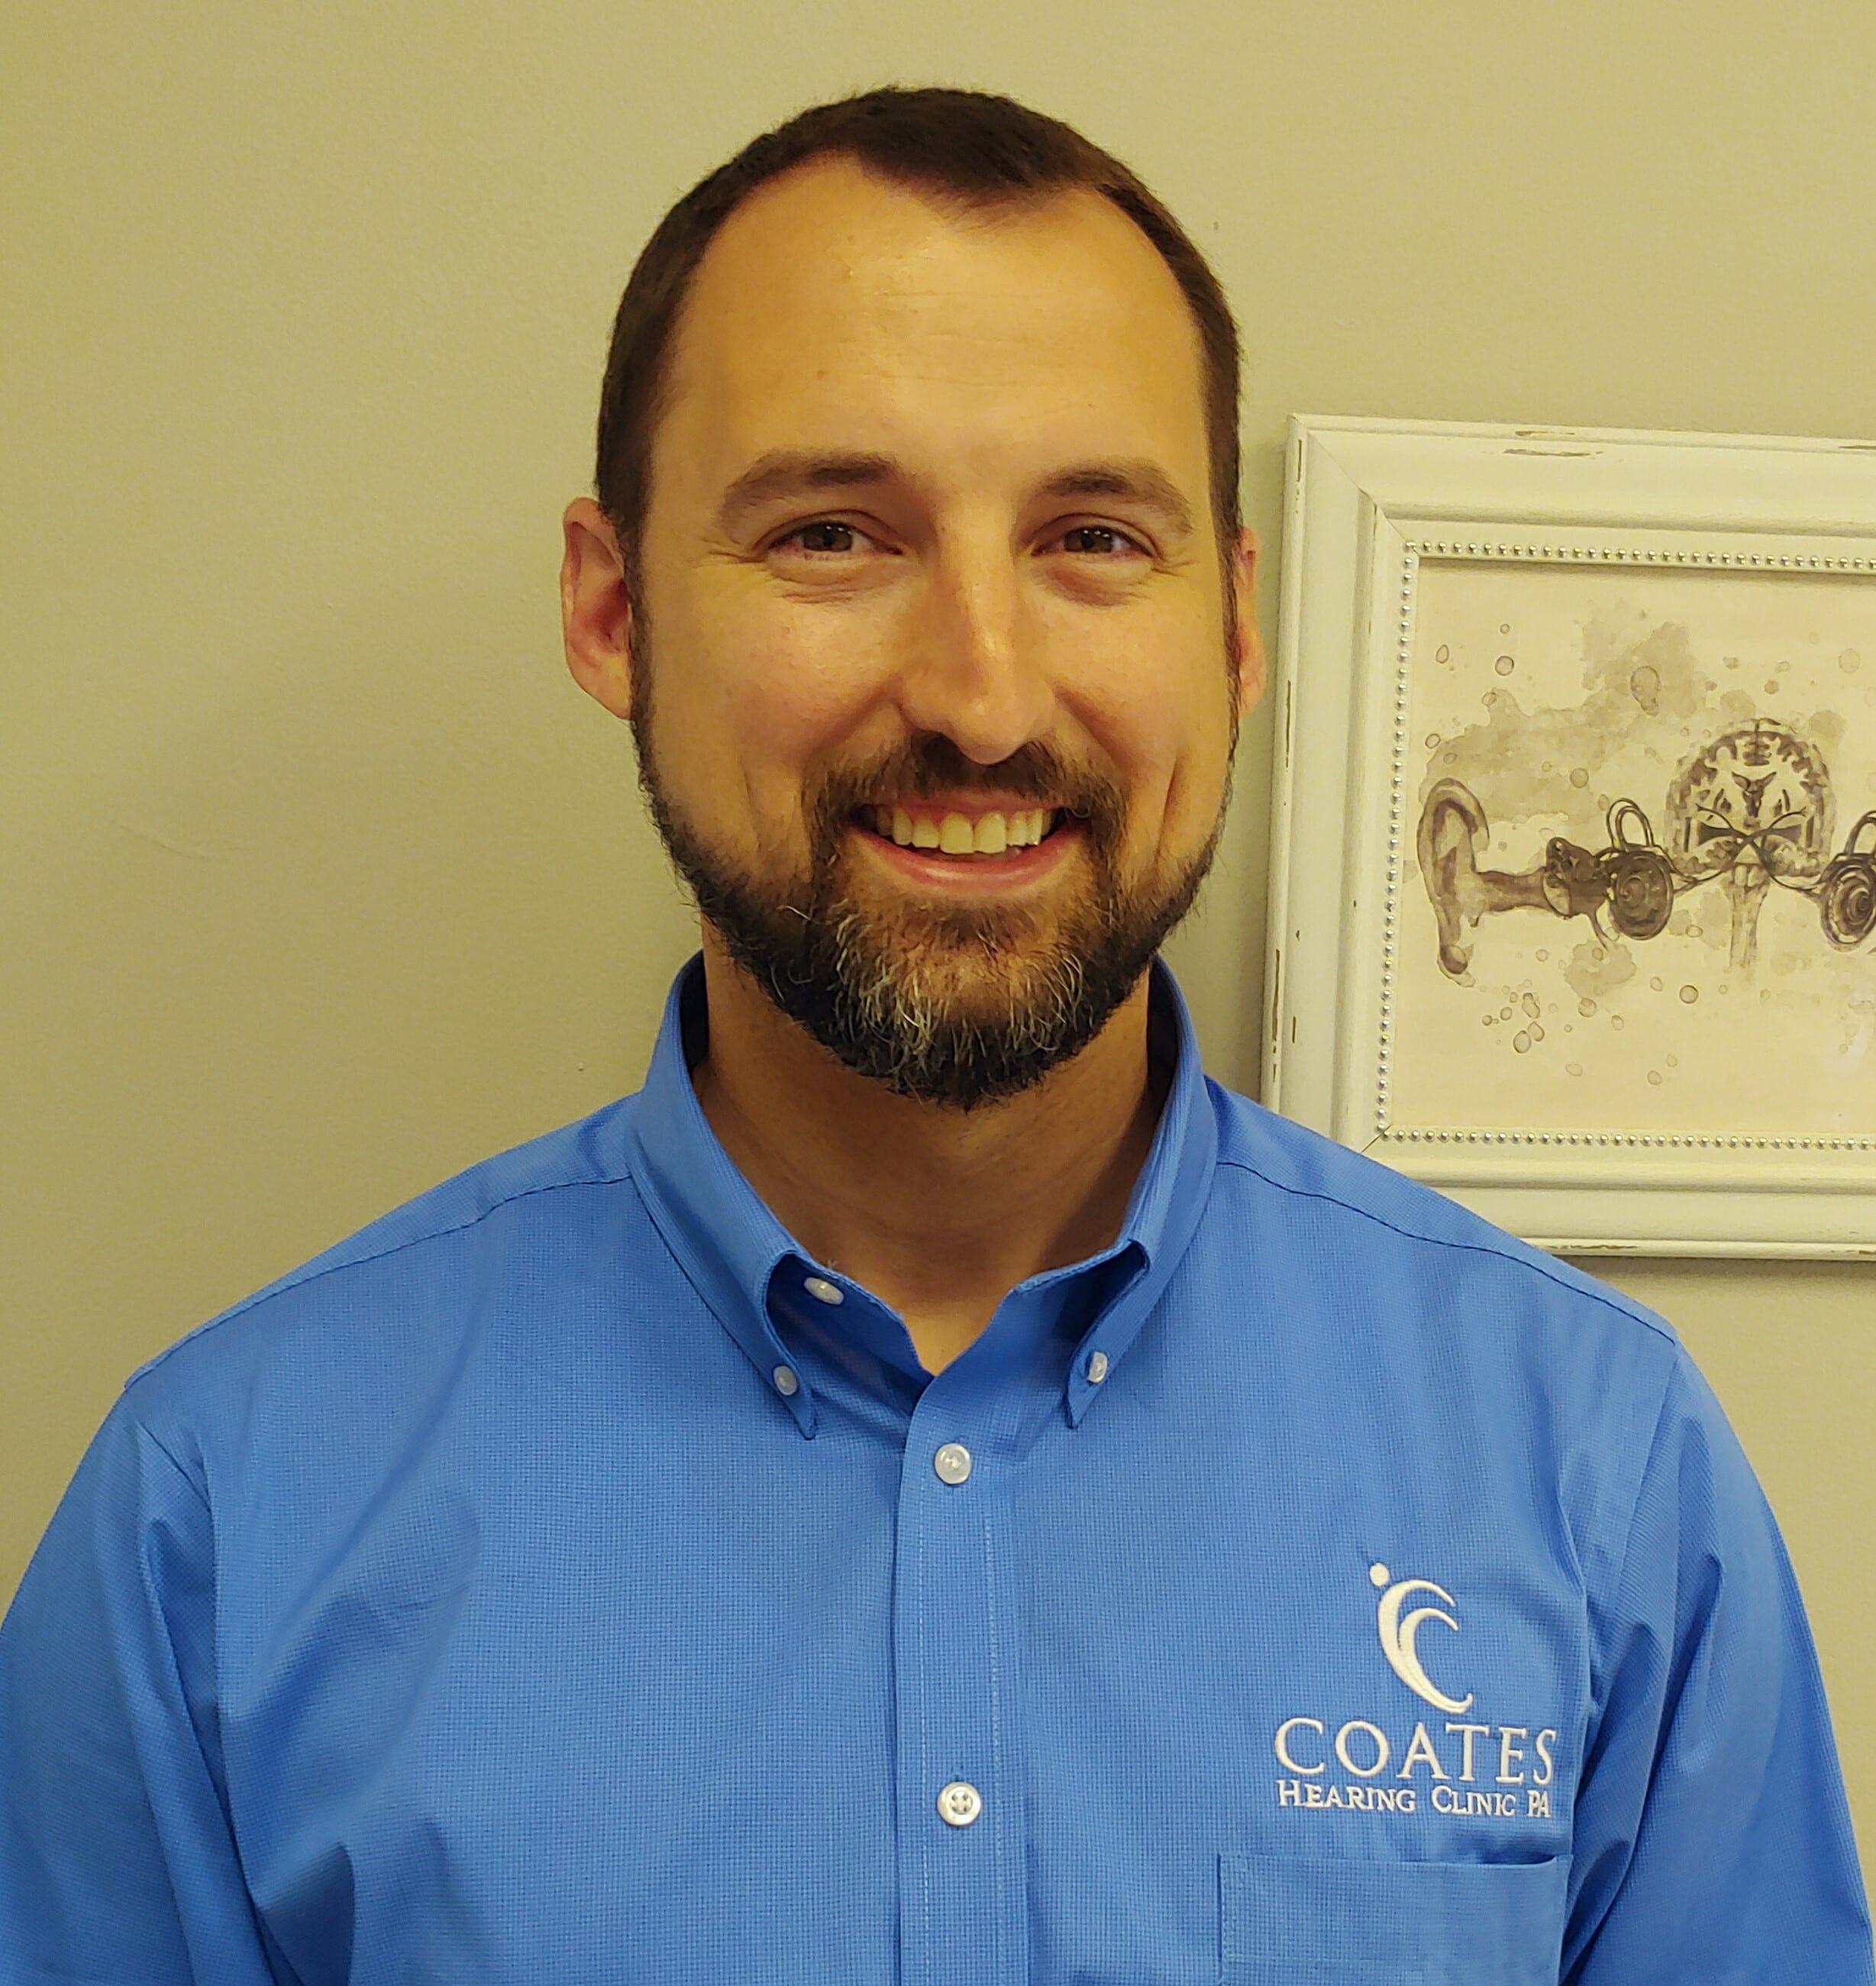 Jordan Coates : Owner